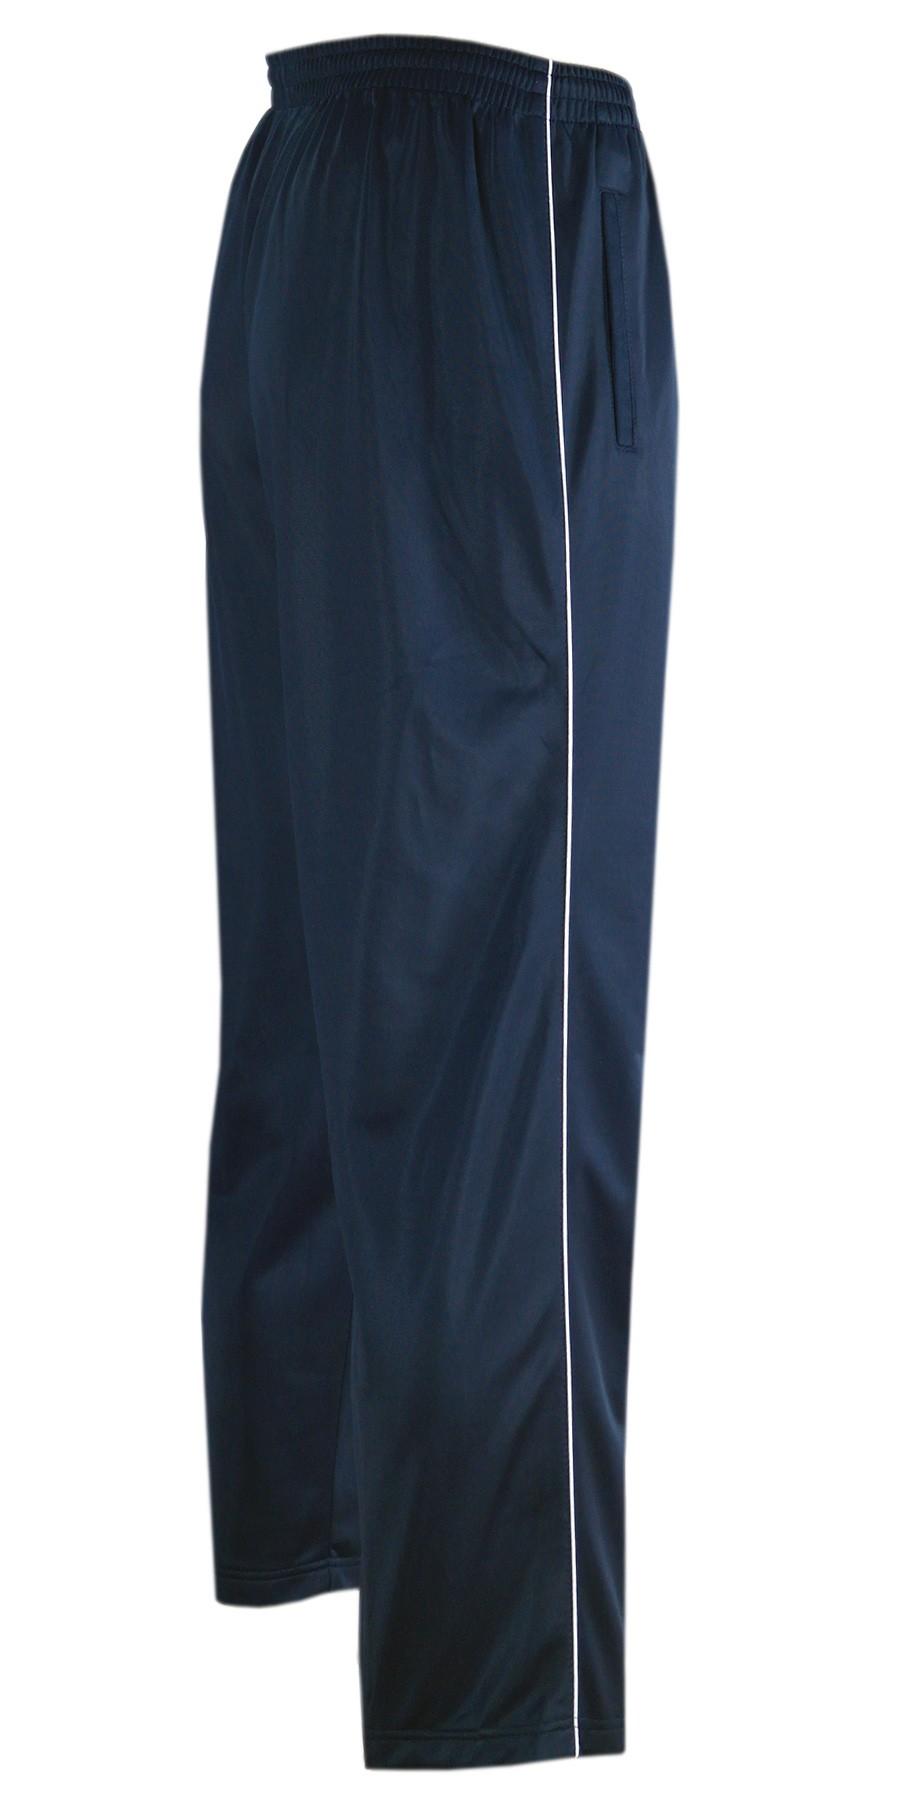 Glänzende Sporthose Herren Freizeit- Jogginghose in Kurzgrößen - dunkelblau